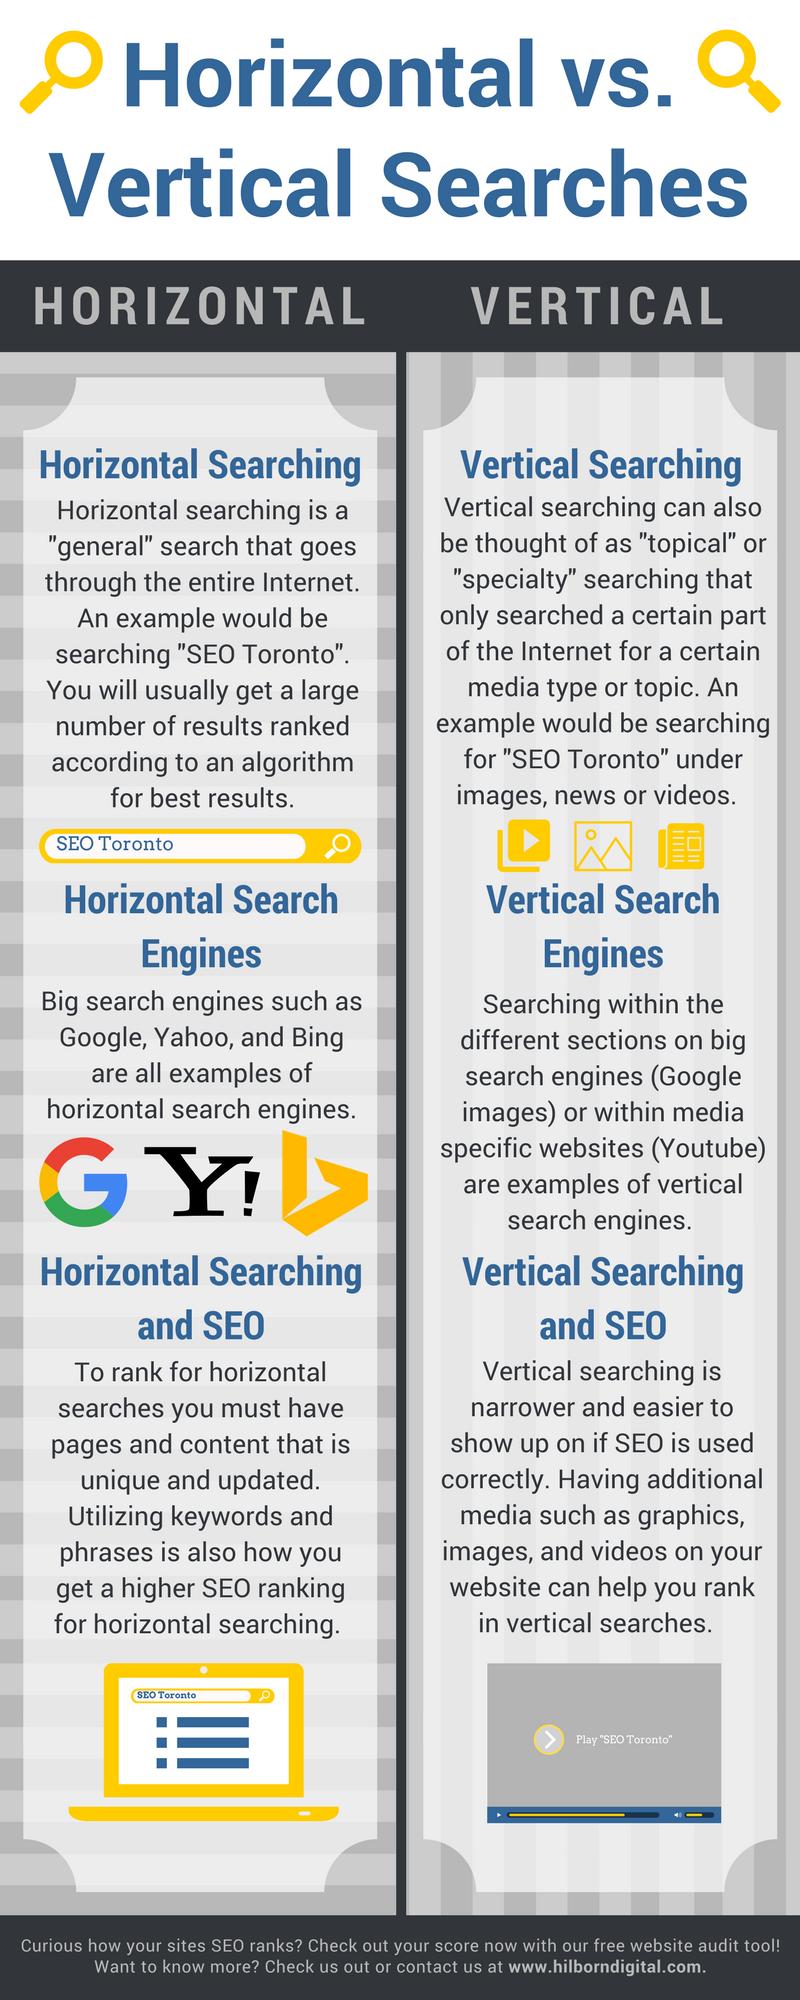 Vertical vs Horizontal Searching